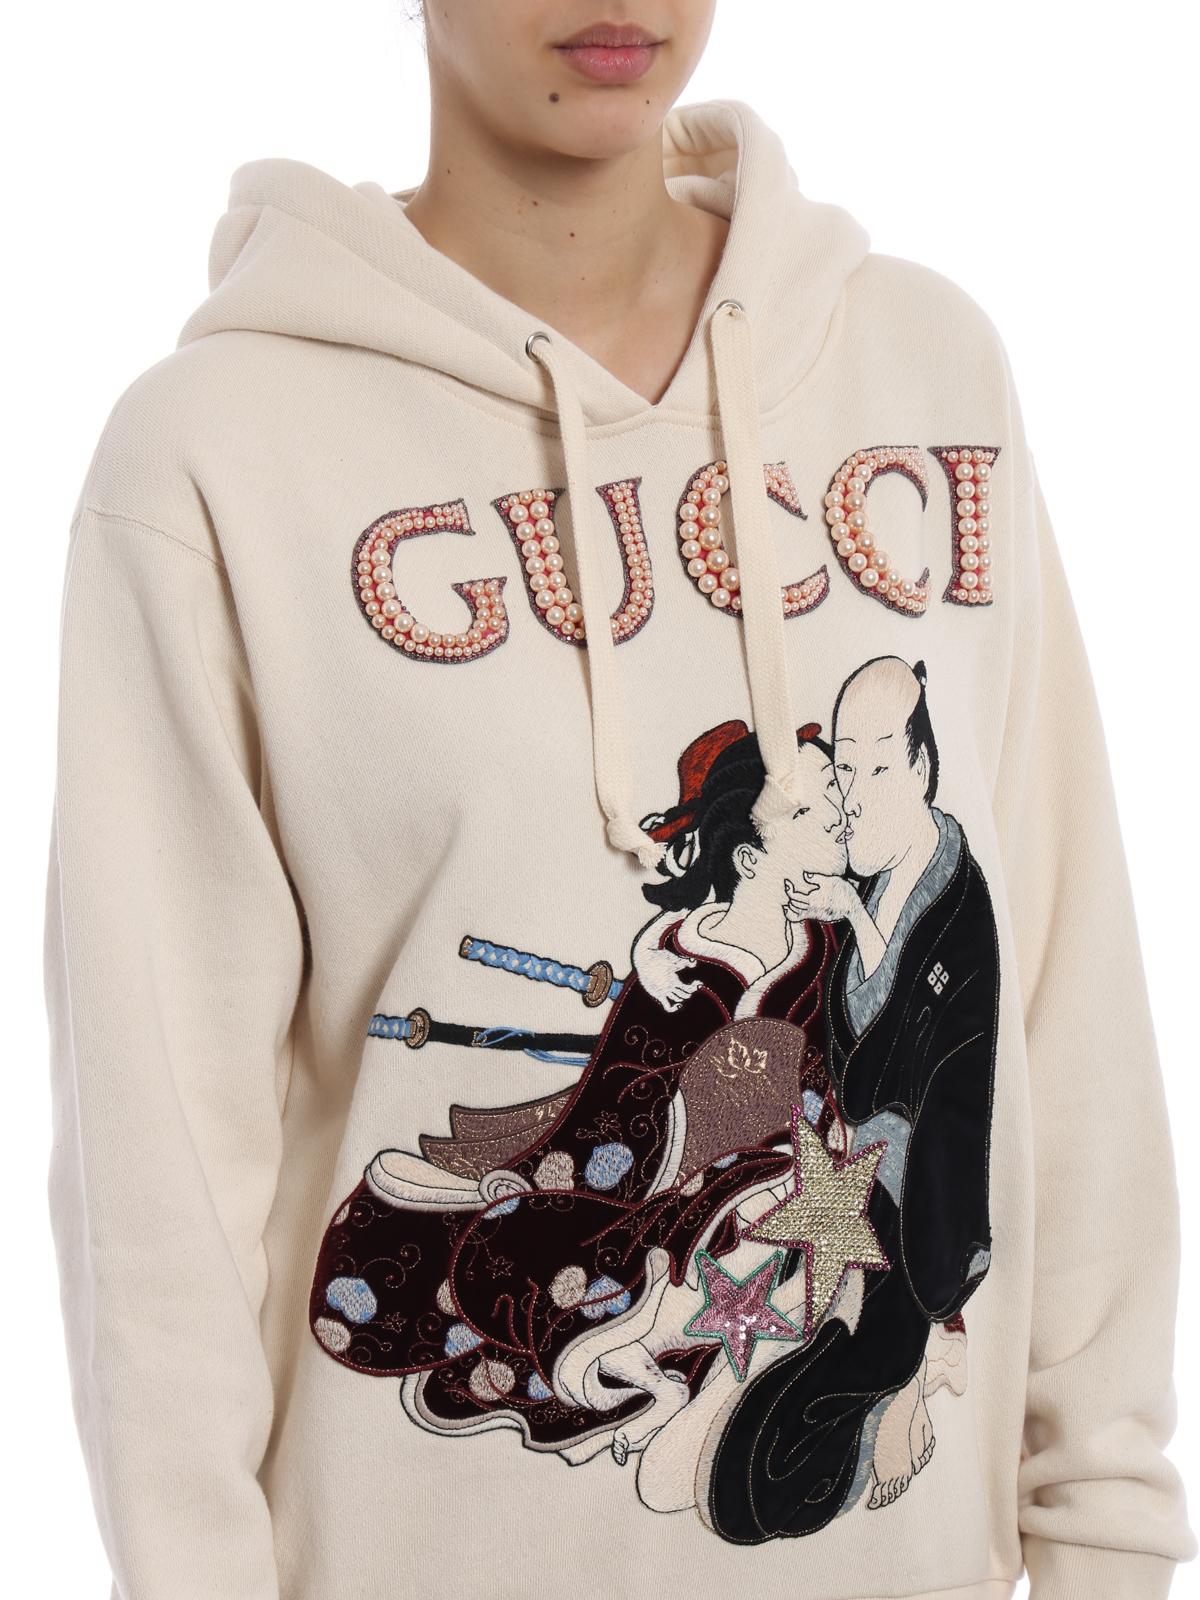 ab56c1e63 GUCCI buy online Geisha pattern embellished hoodie. GUCCI: Sweatshirts &  Sweaters ...